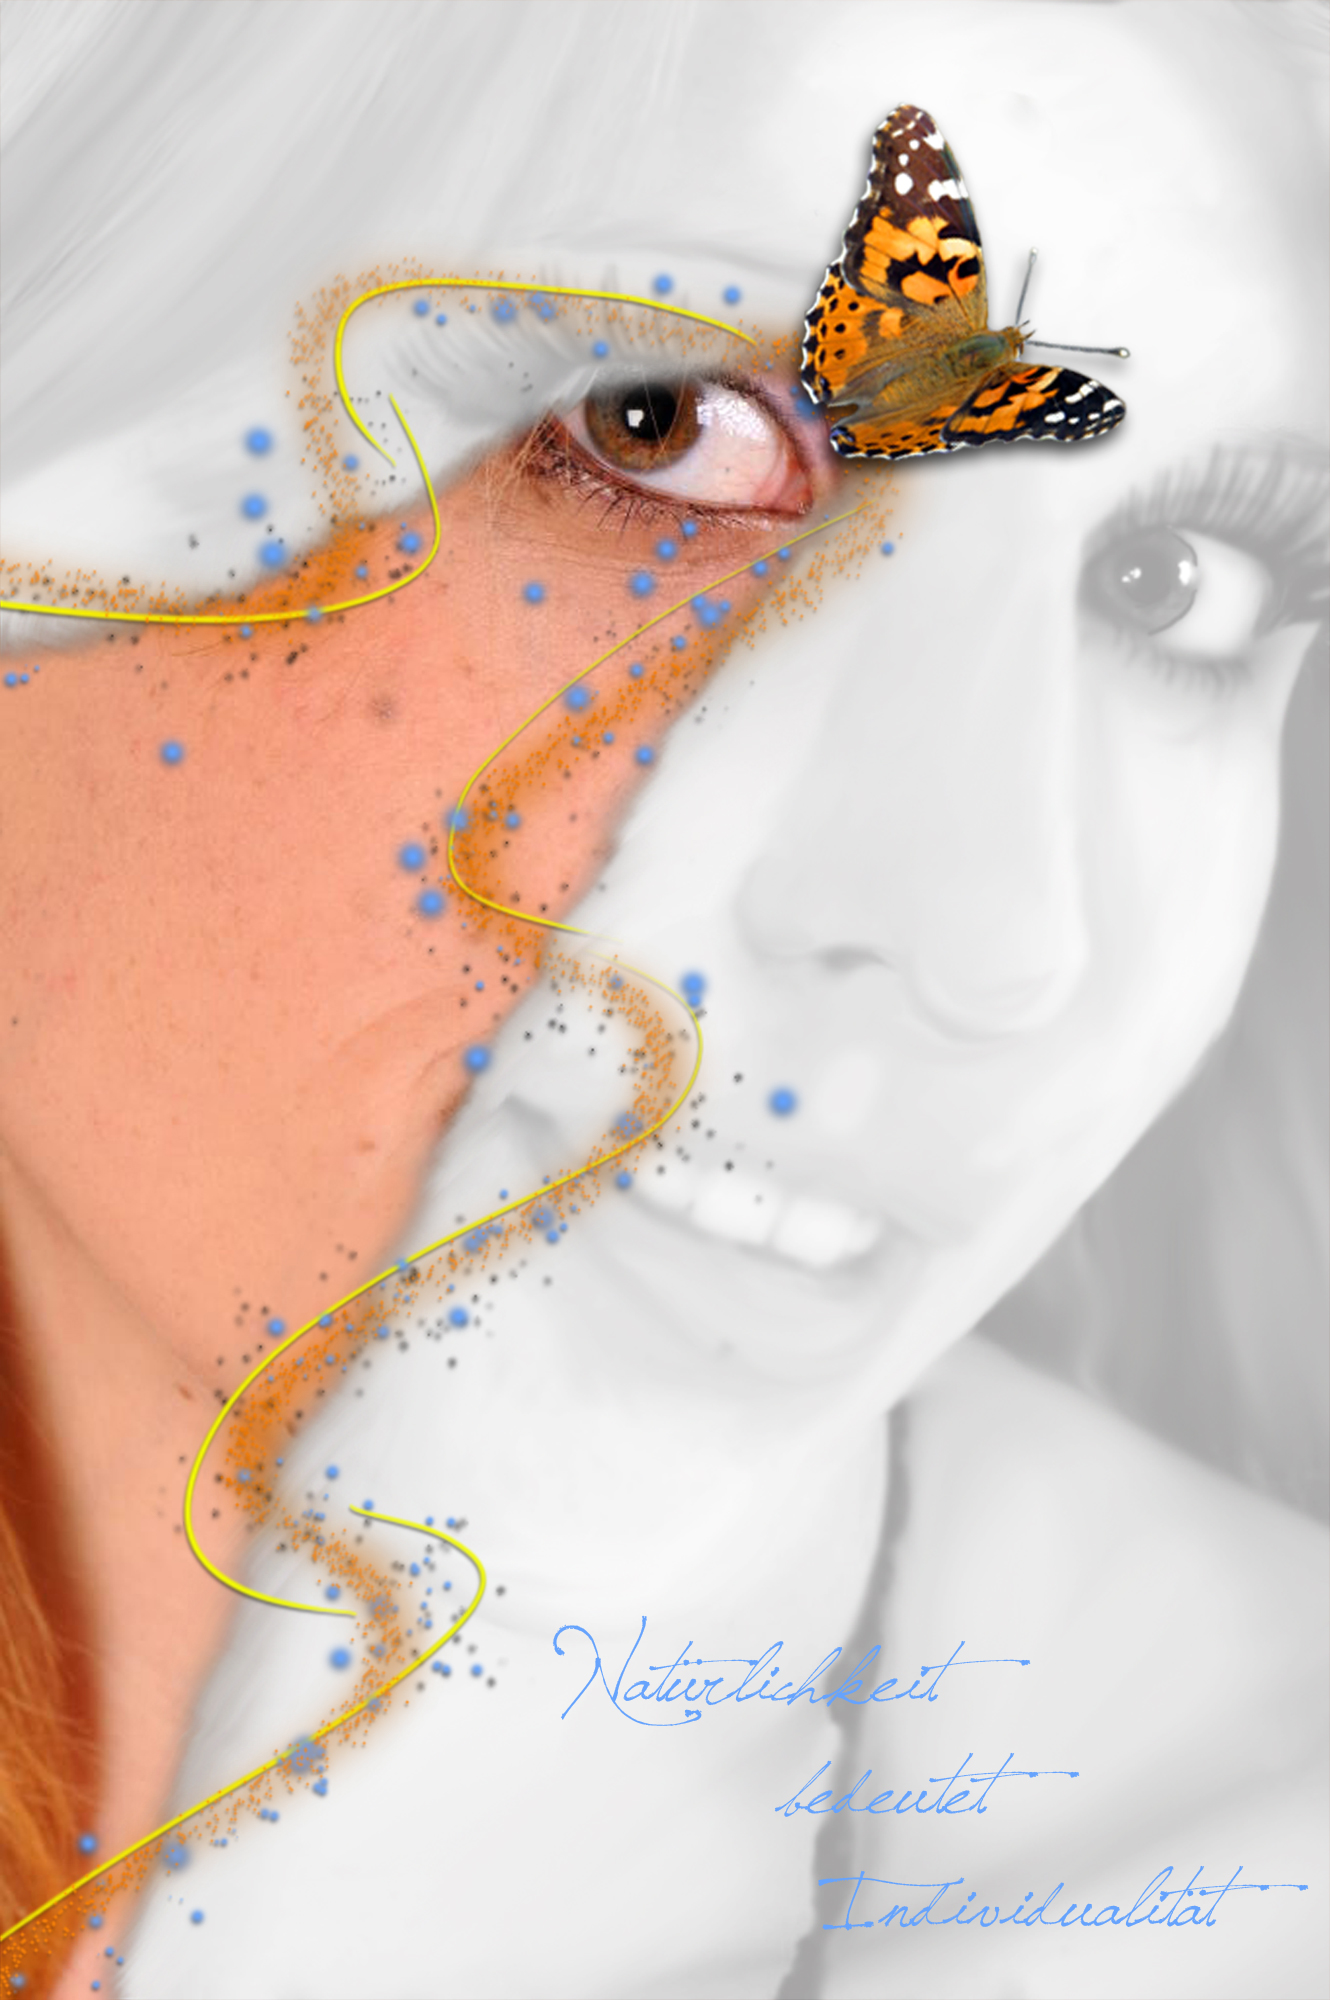 MinayasStudio's Profile Picture